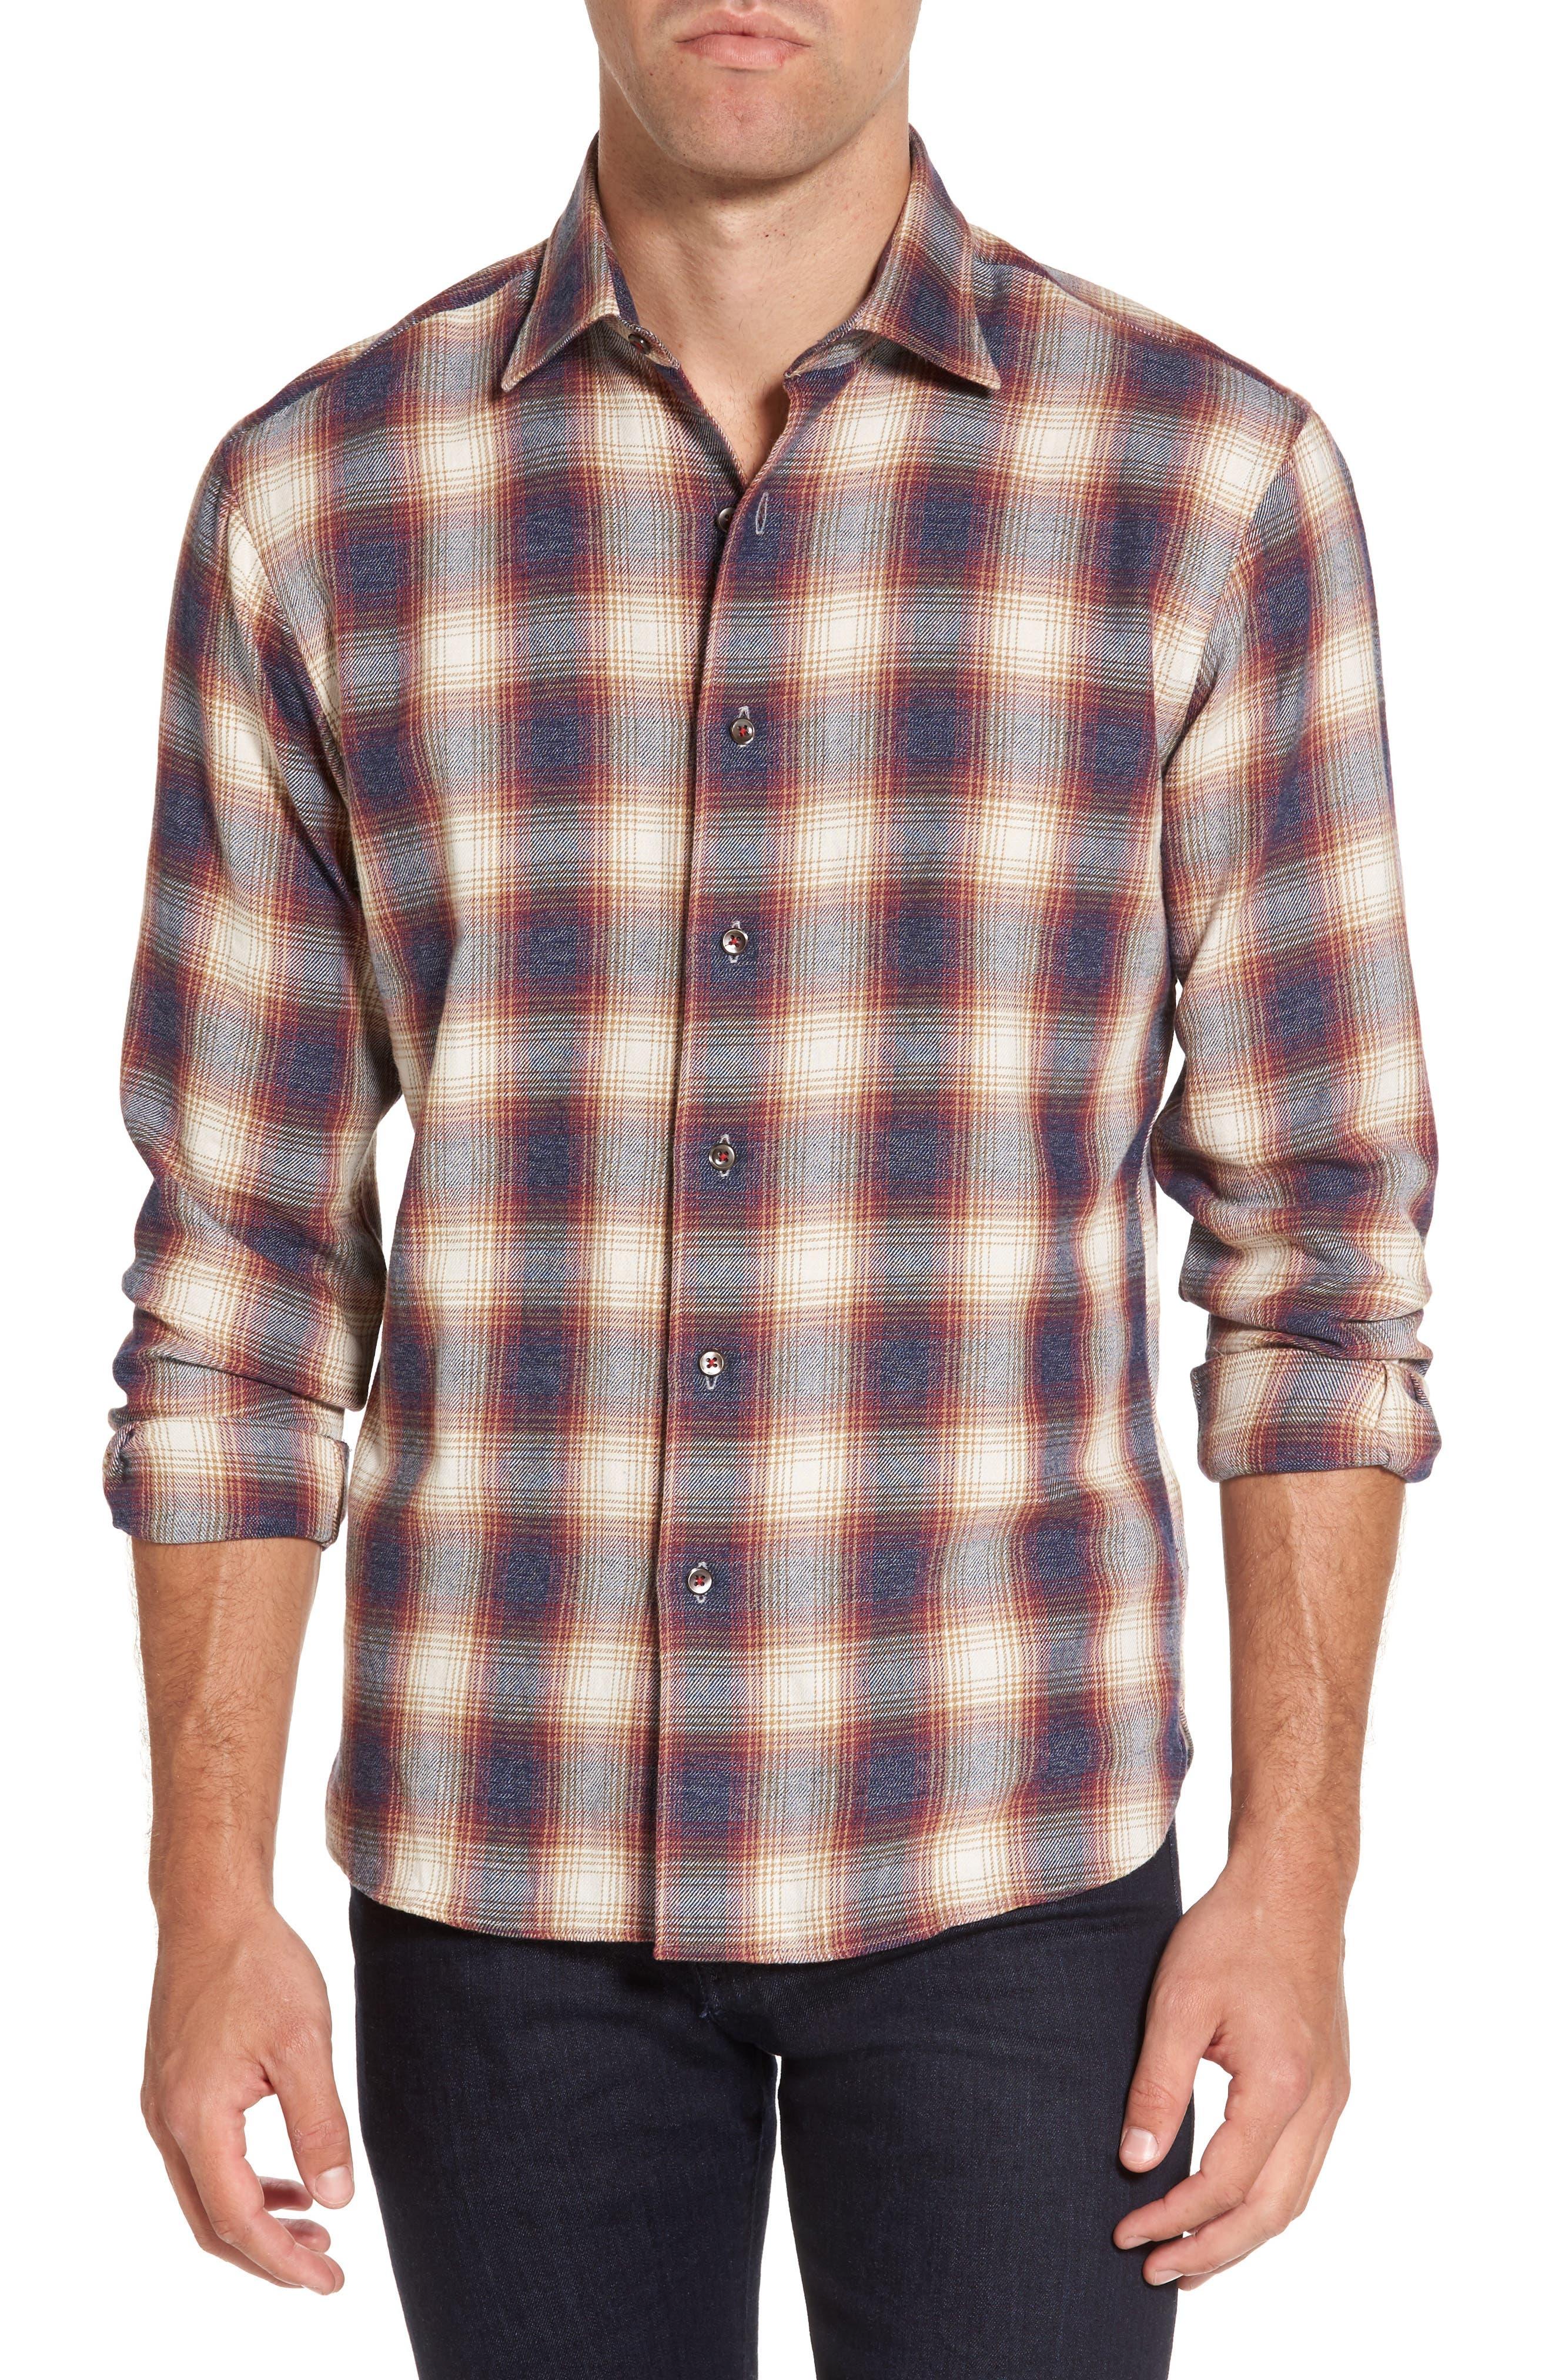 Main Image - New England Shirt Co. Slim Fit Plaid Sport Shirt